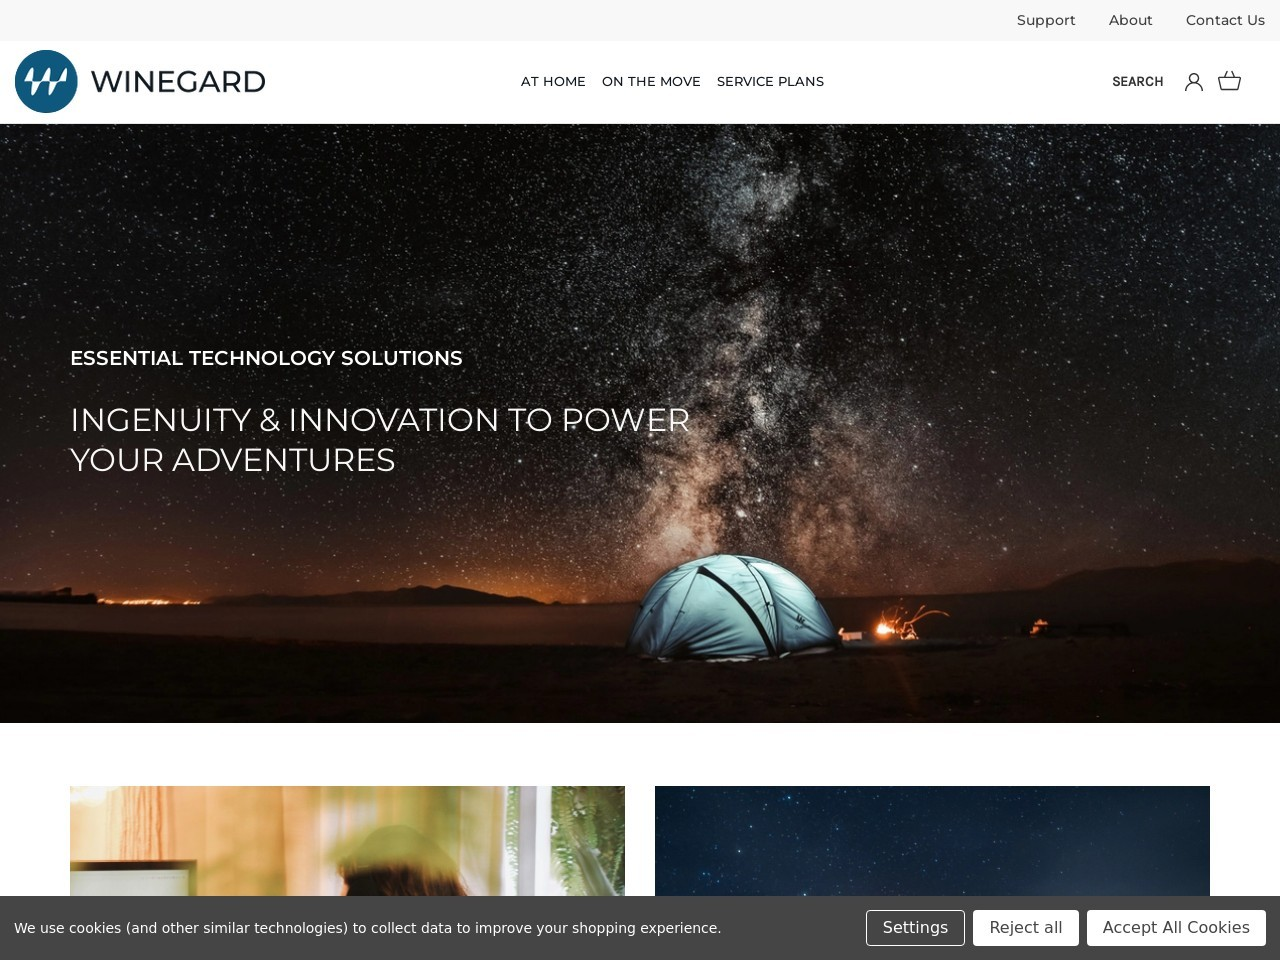 winegard.com